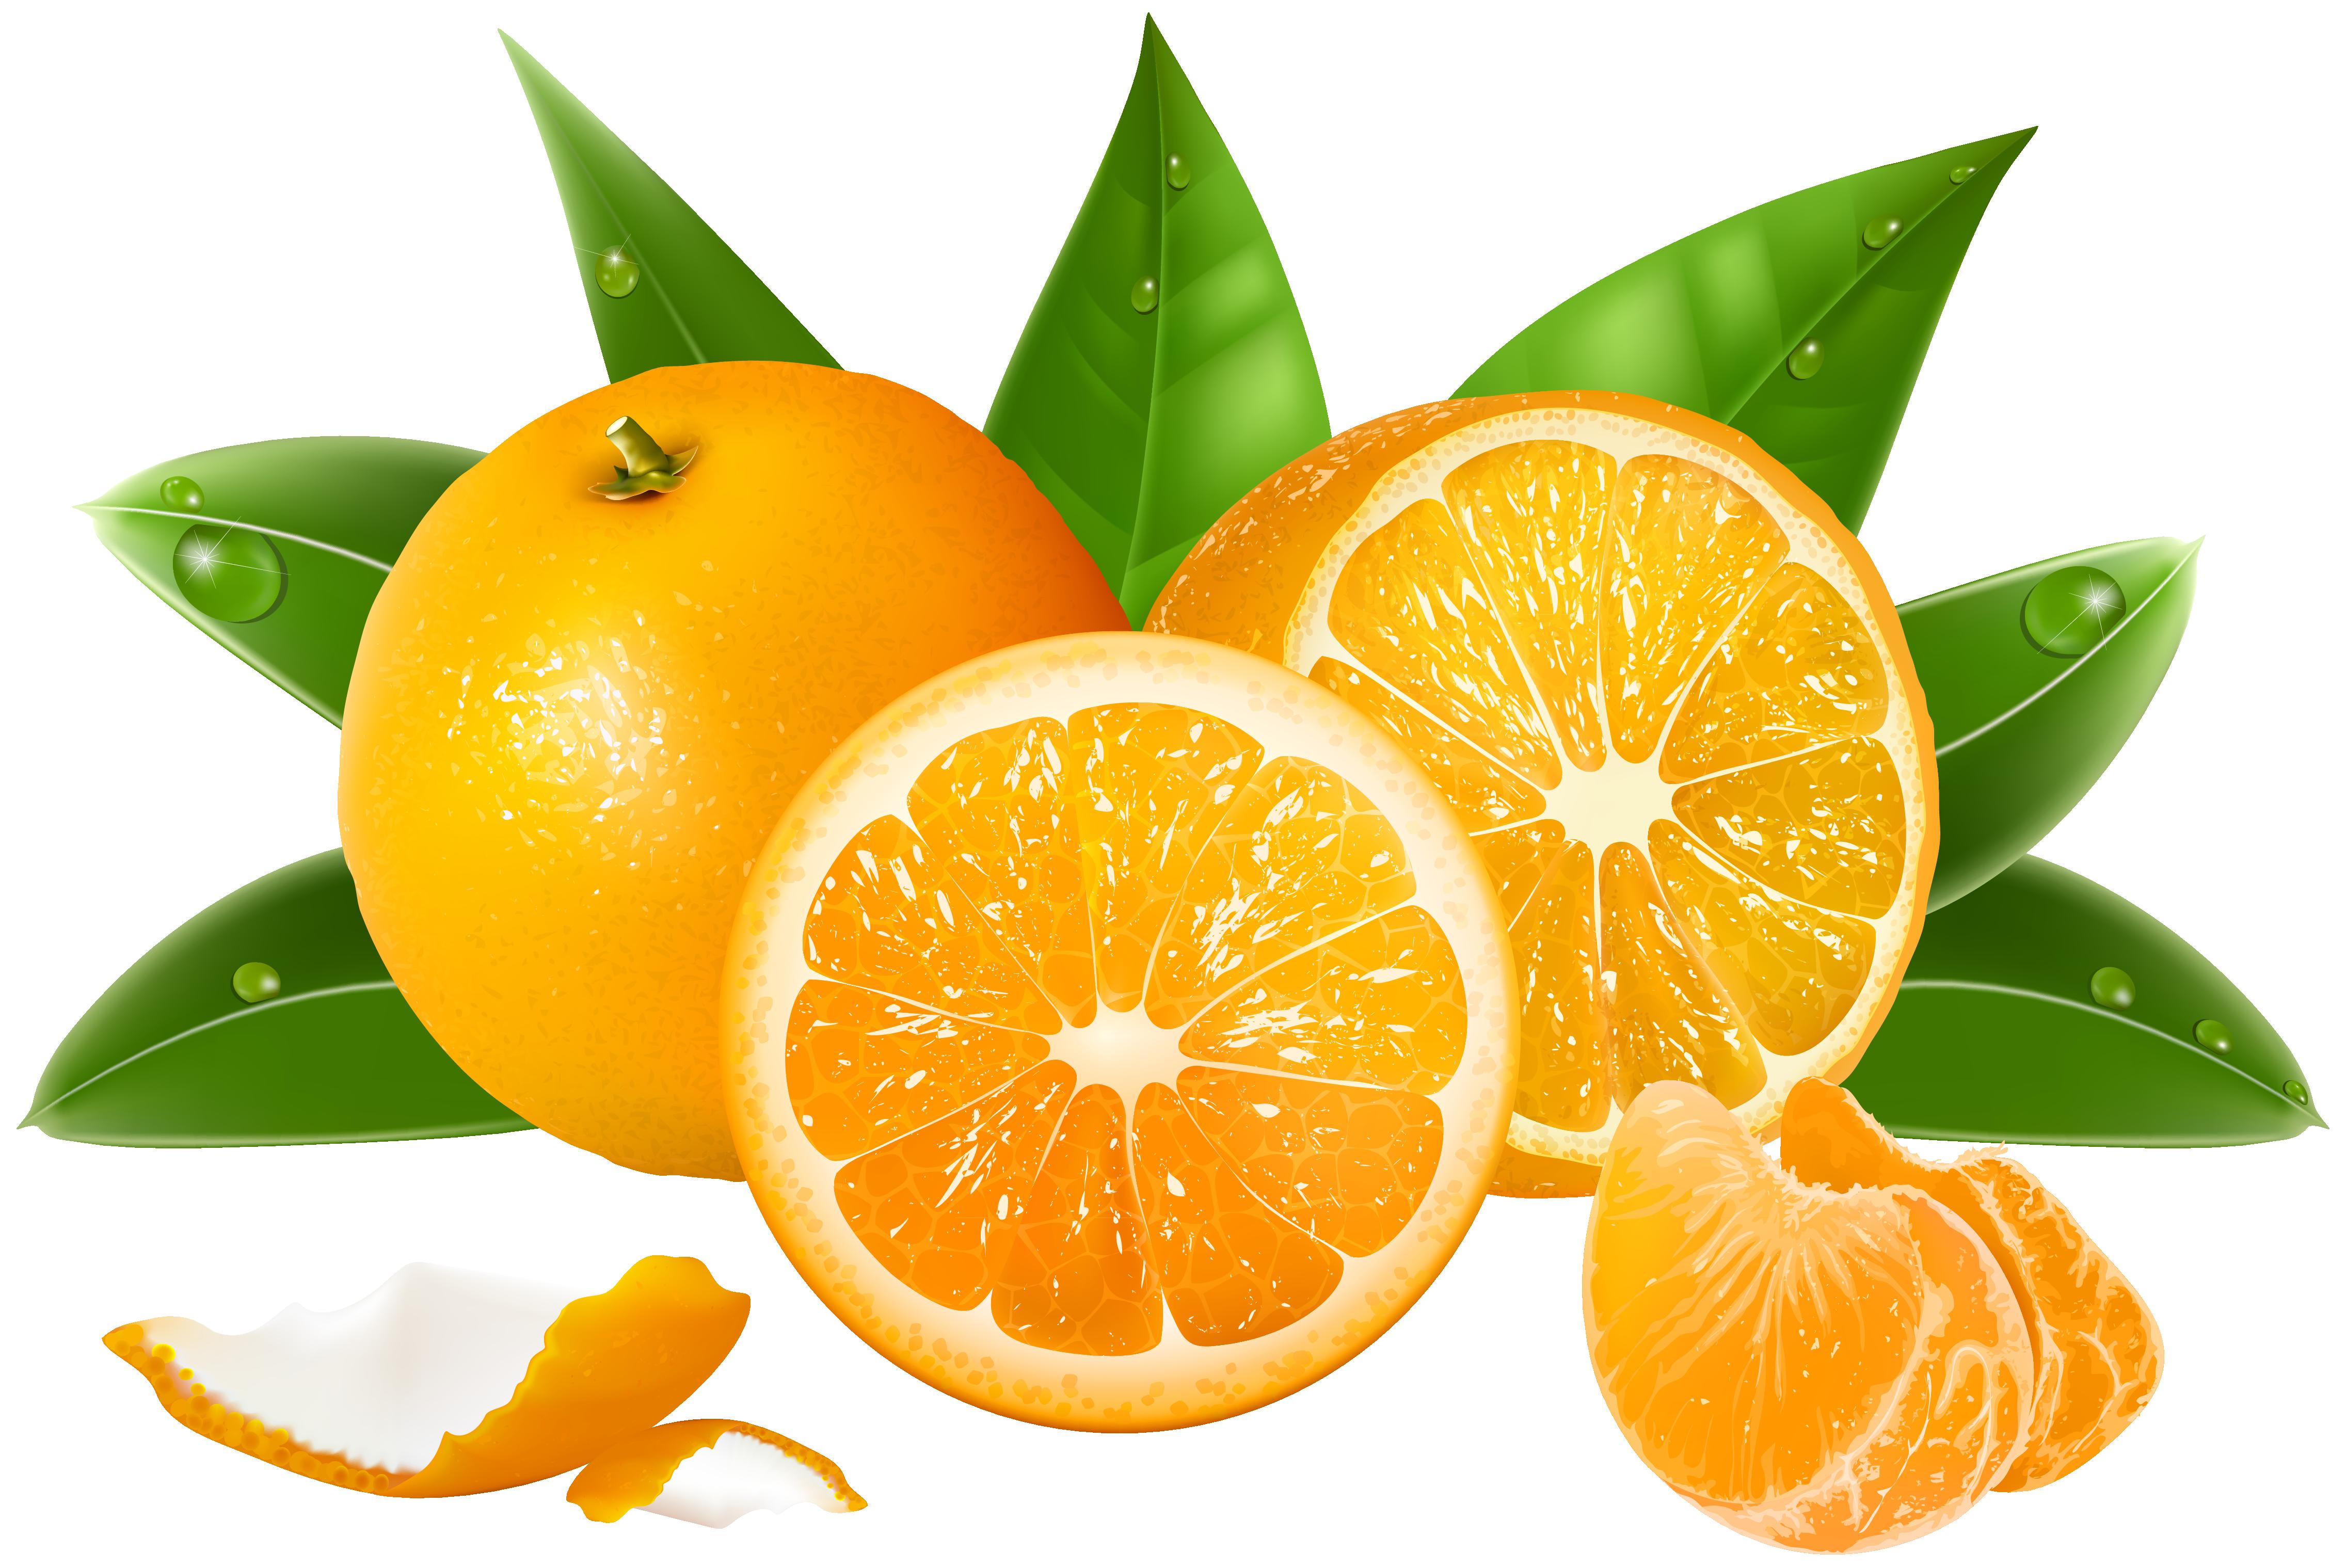 Oranges PNG Clipart Image.